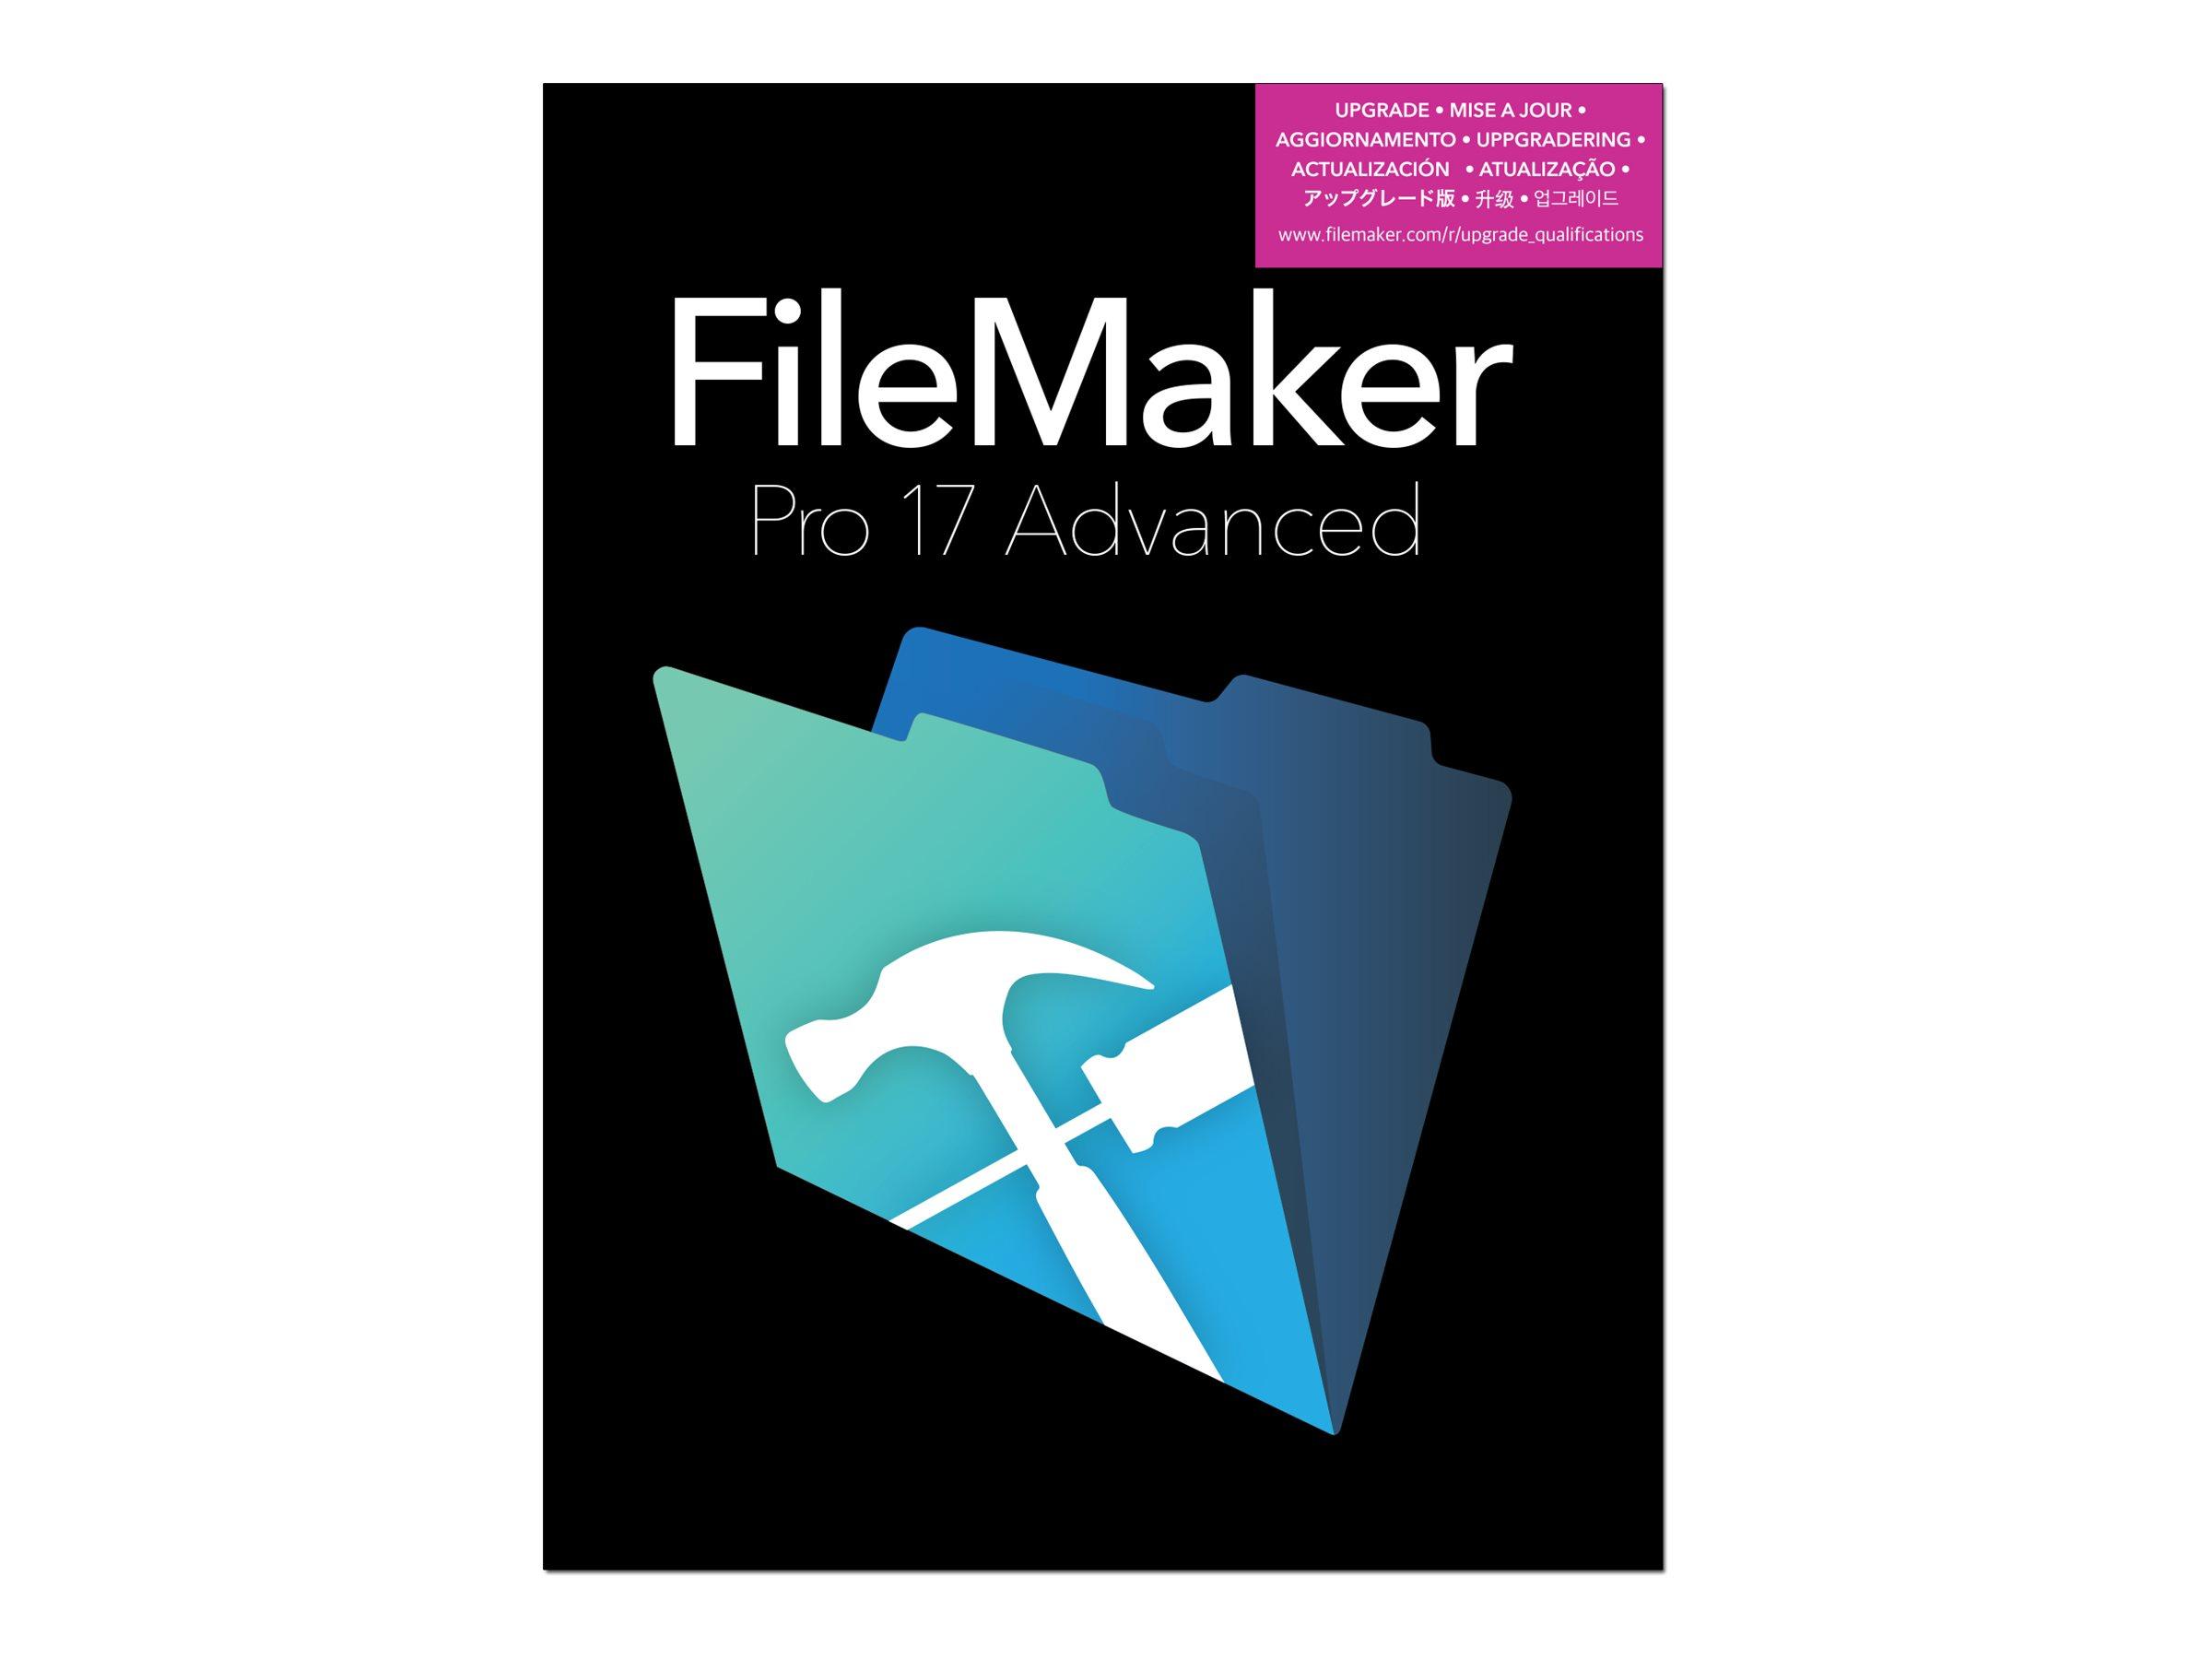 FileMaker Pro Advanced - (v. 17) - Box-Pack (Upgrade) - Upgrade von FileMaker Pro 15,16 / FileMaker Pro Advanced 15,16 - Win, Ma